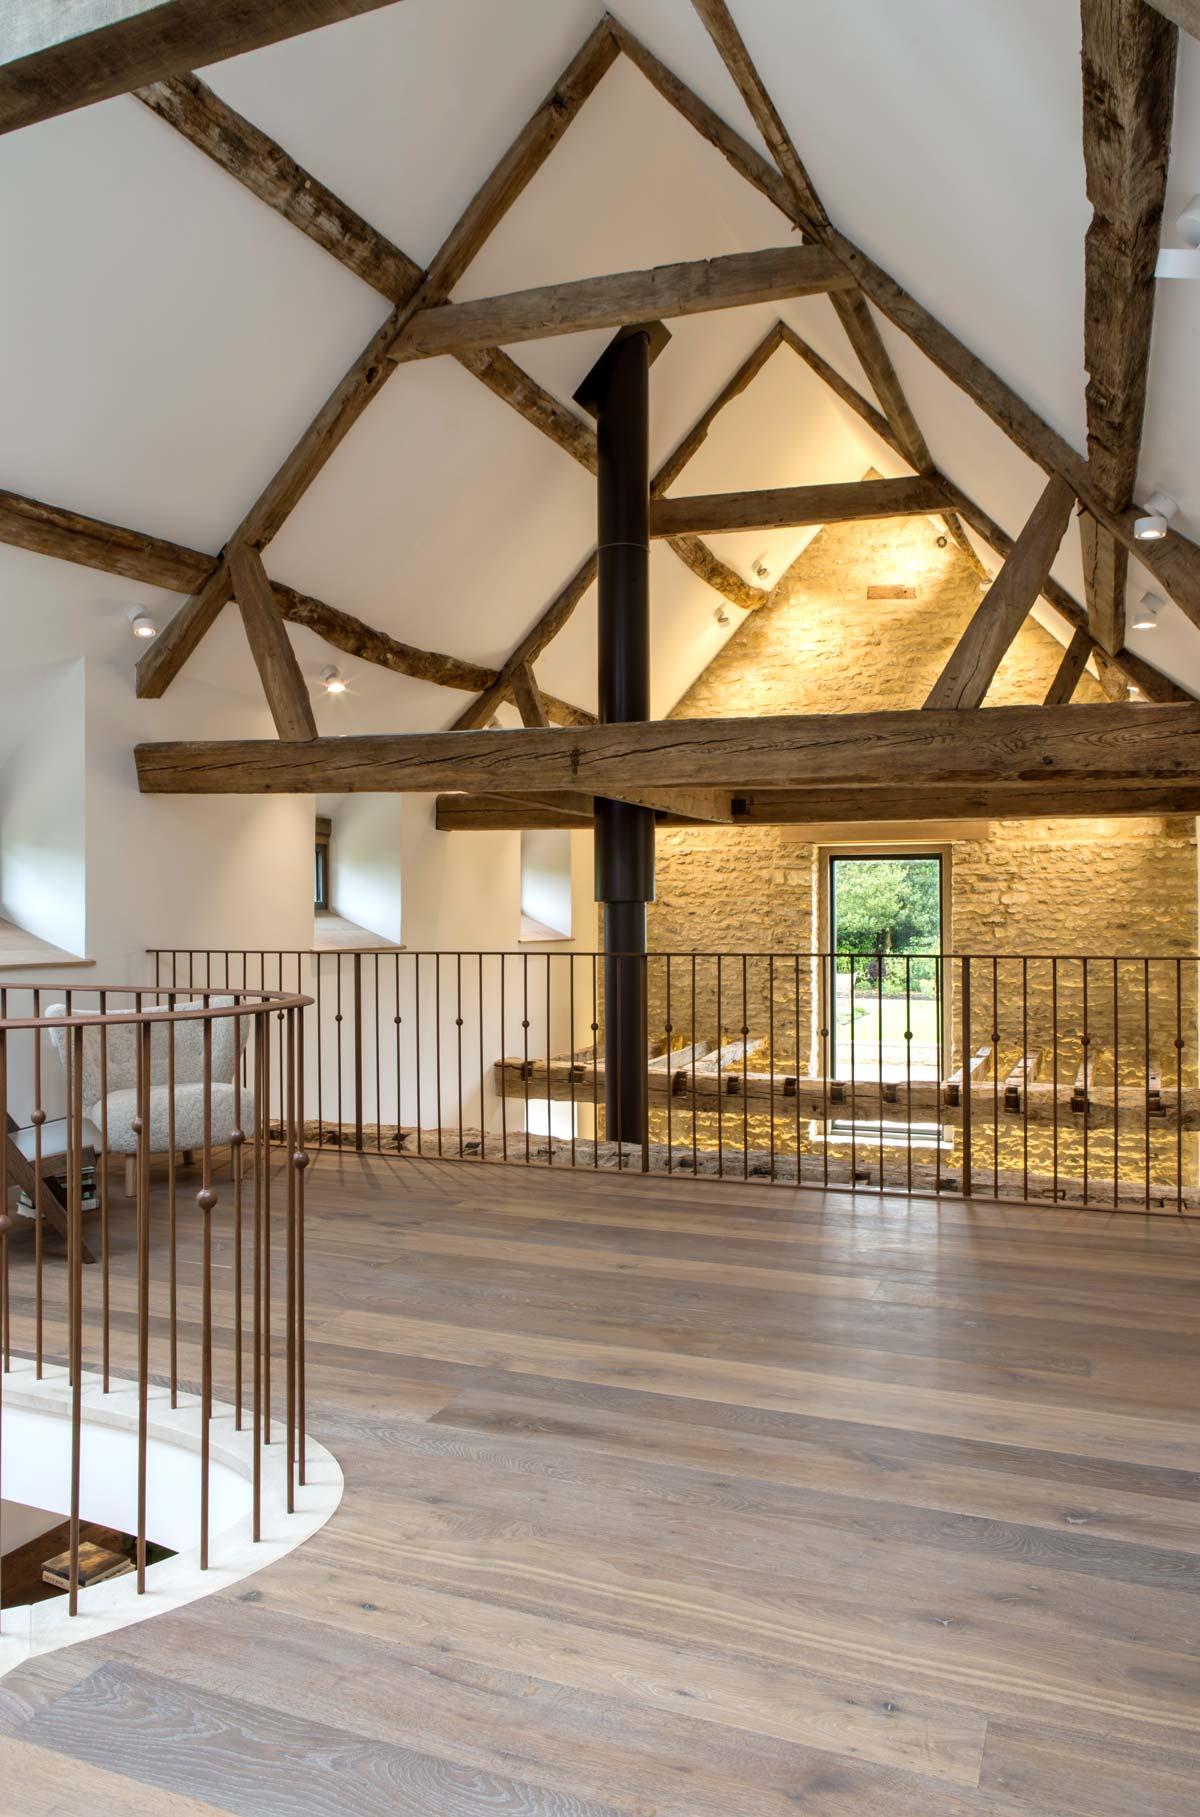 barn-conversion-mezzanine-rogue-designs.jpg